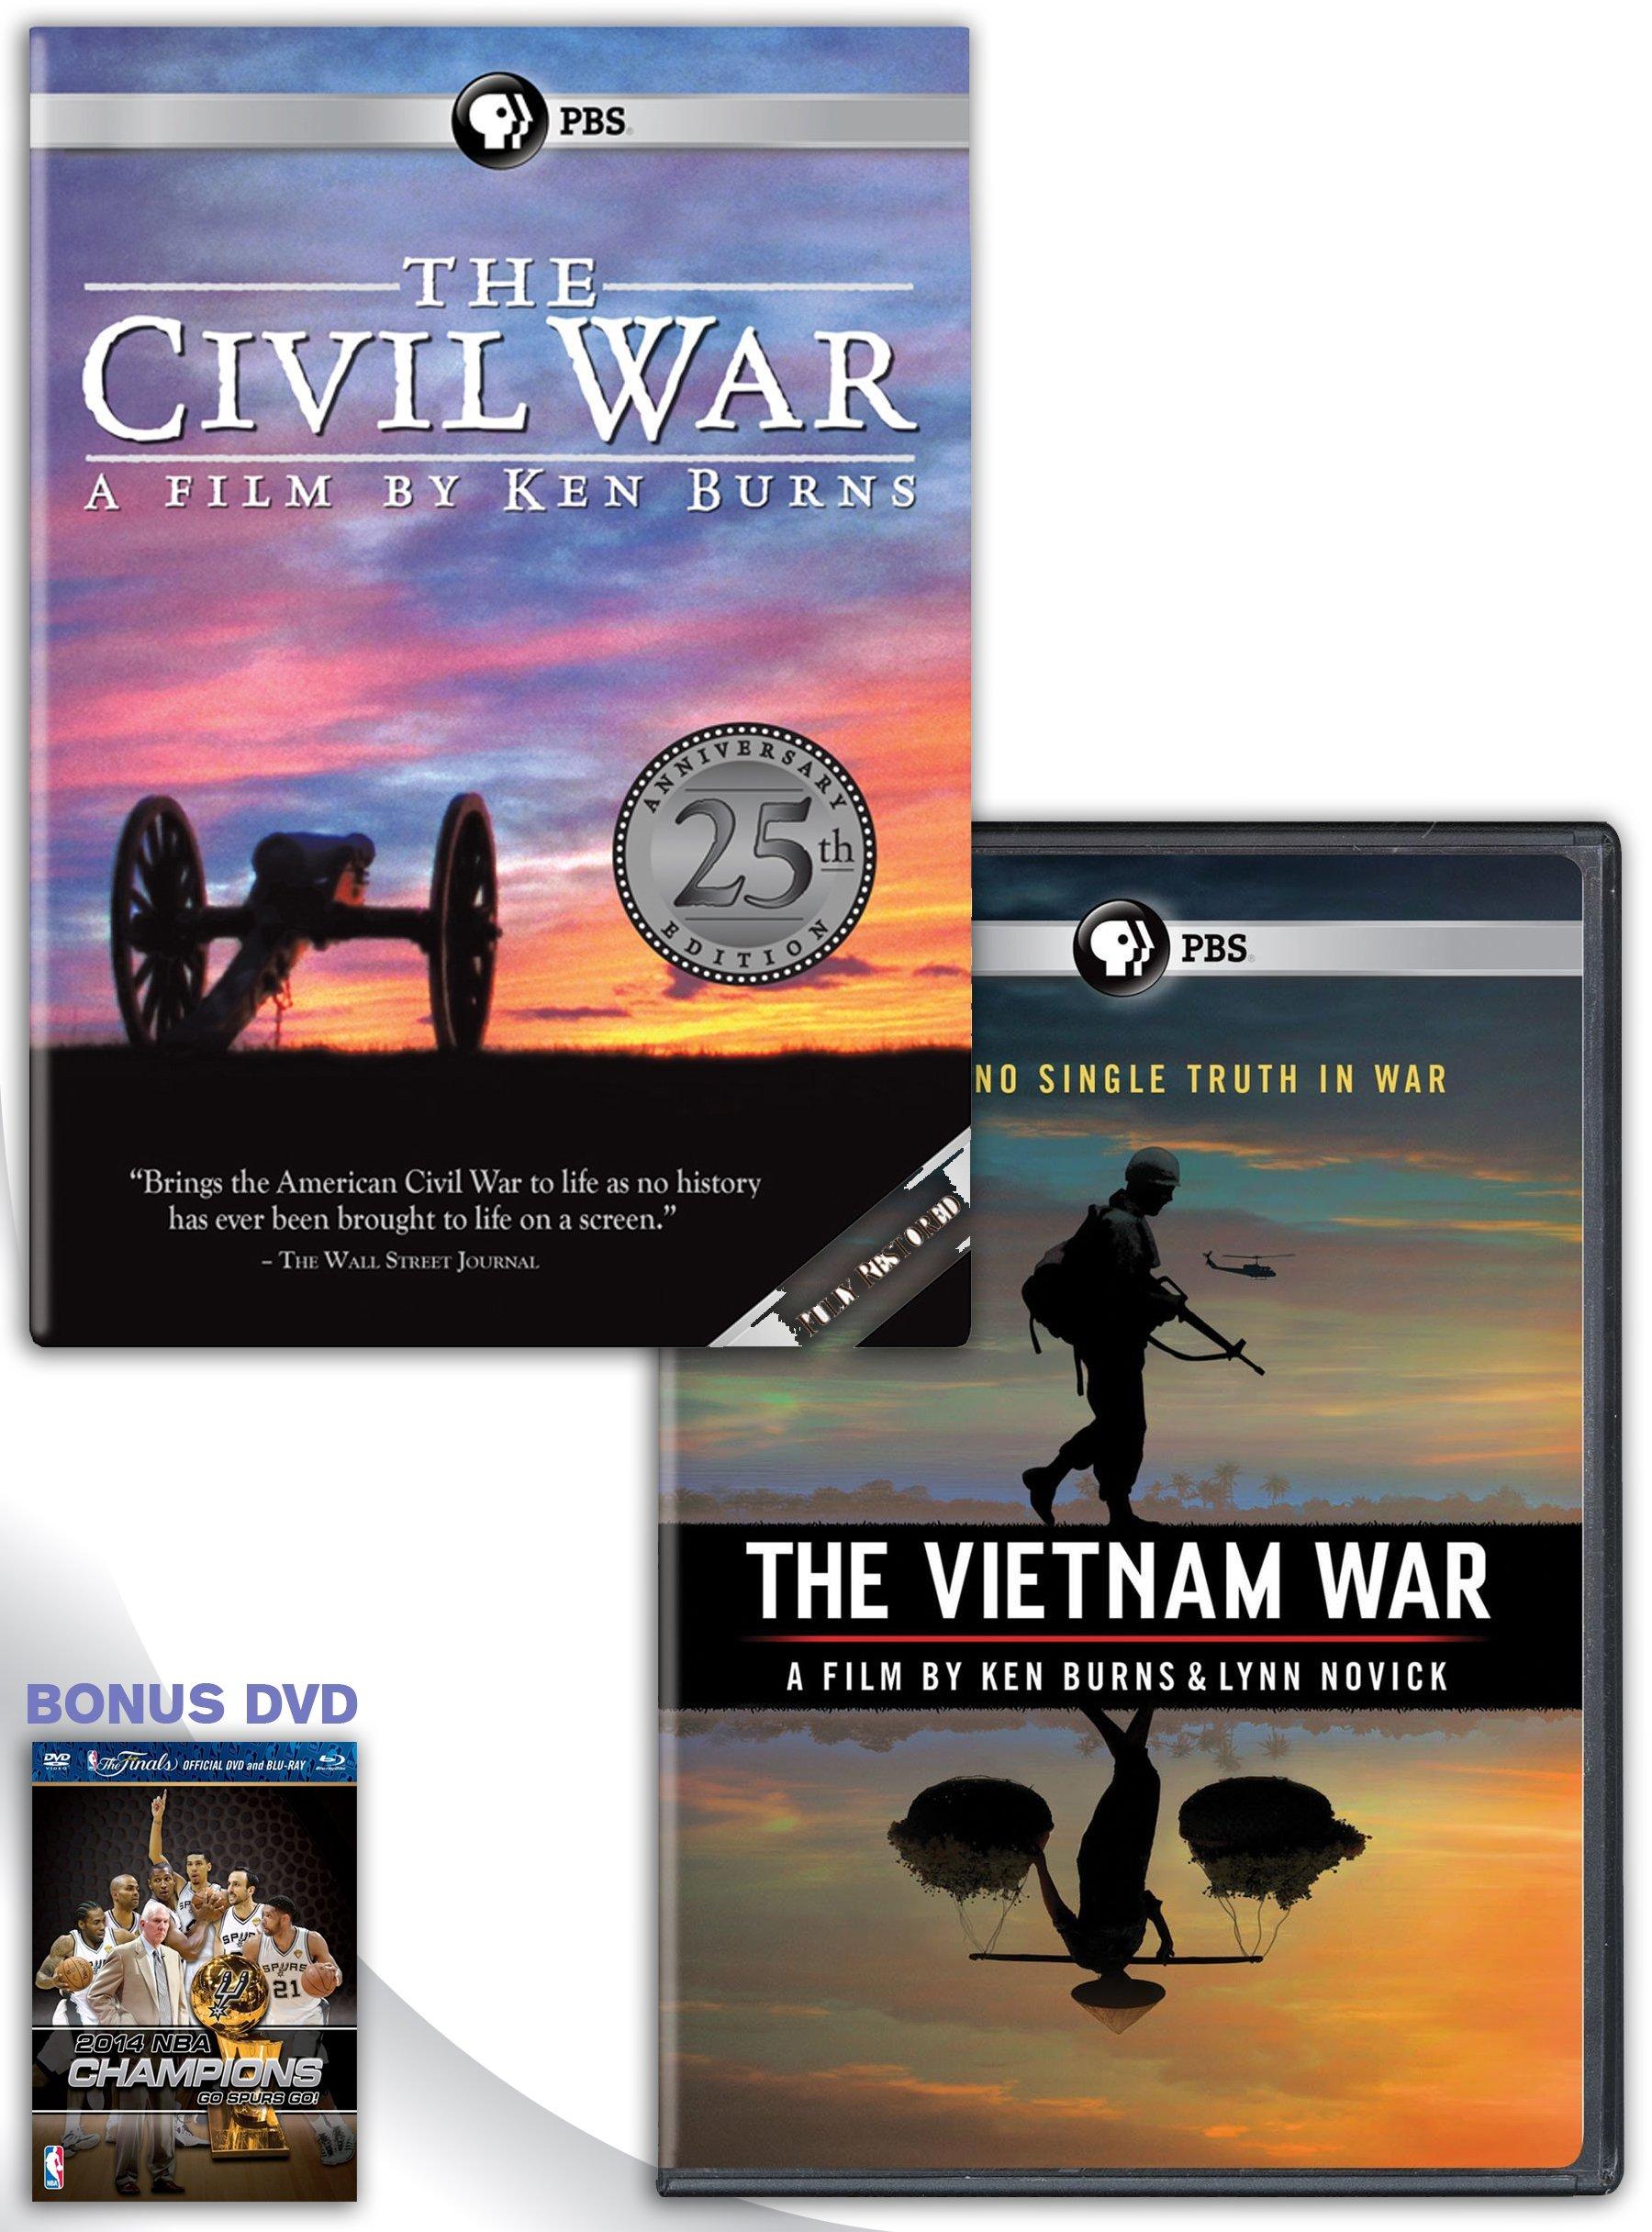 The Civil War Restored for 2015, 25th Anniversary Edition + The Vietnam War: A Film by Ken Burns and Lynn Novick DVD Box Set with Bonus DVD by P B S